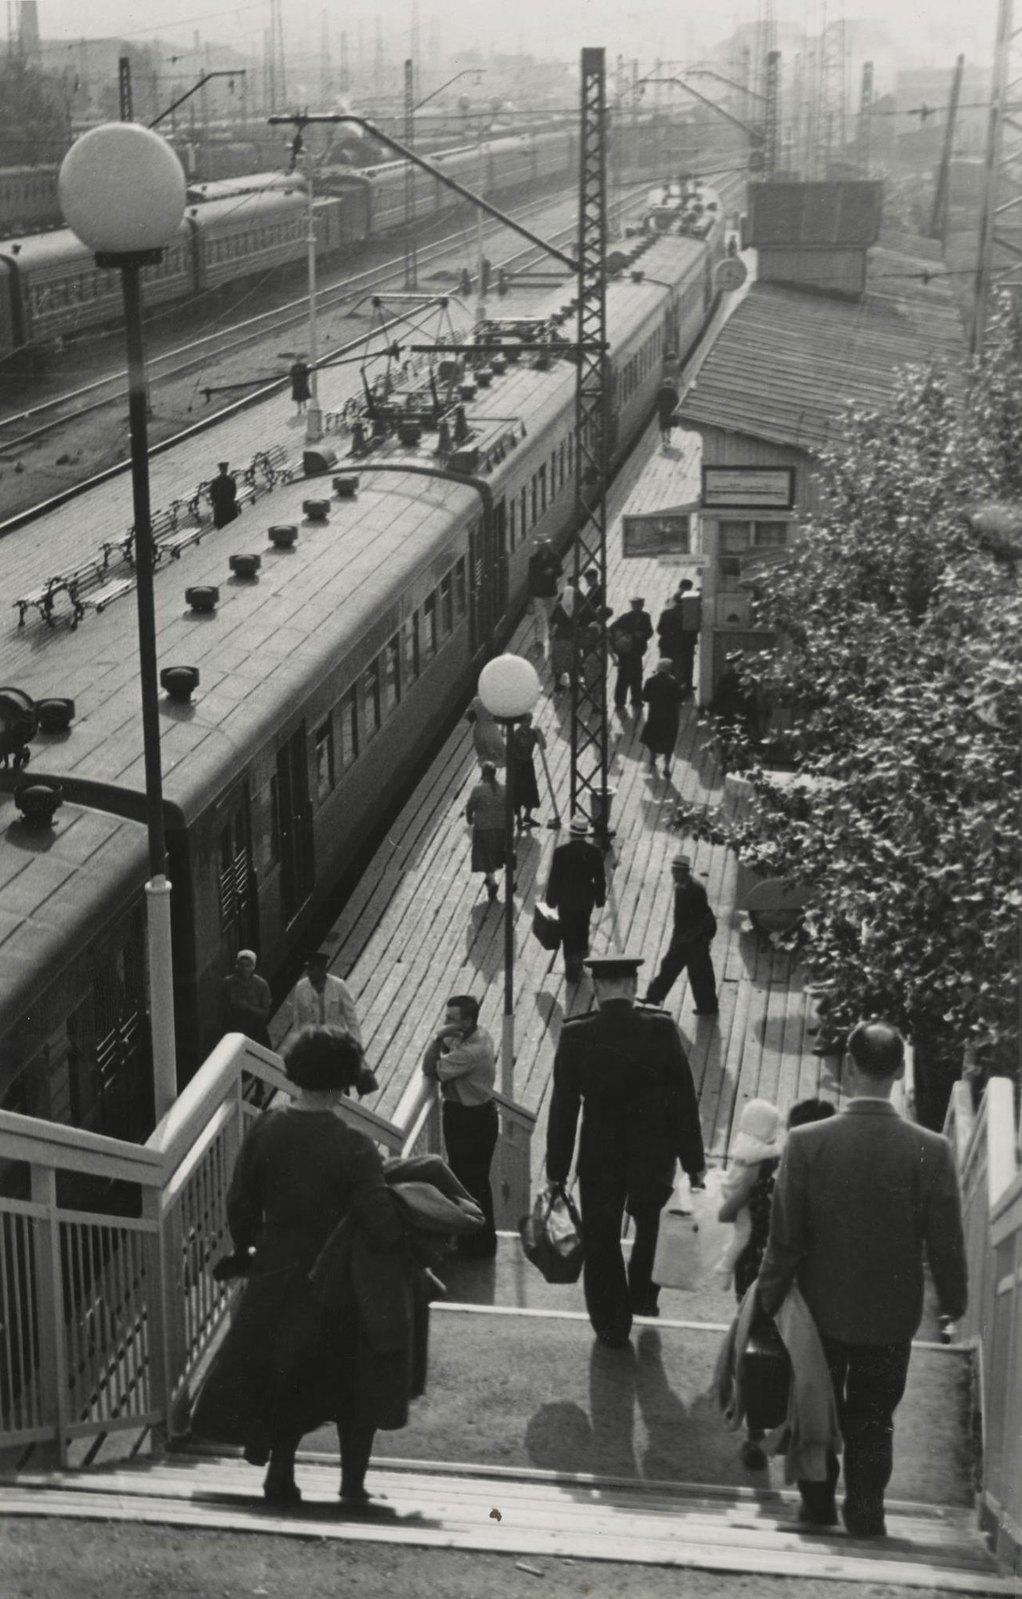 1950-е. Дачники. На поезд